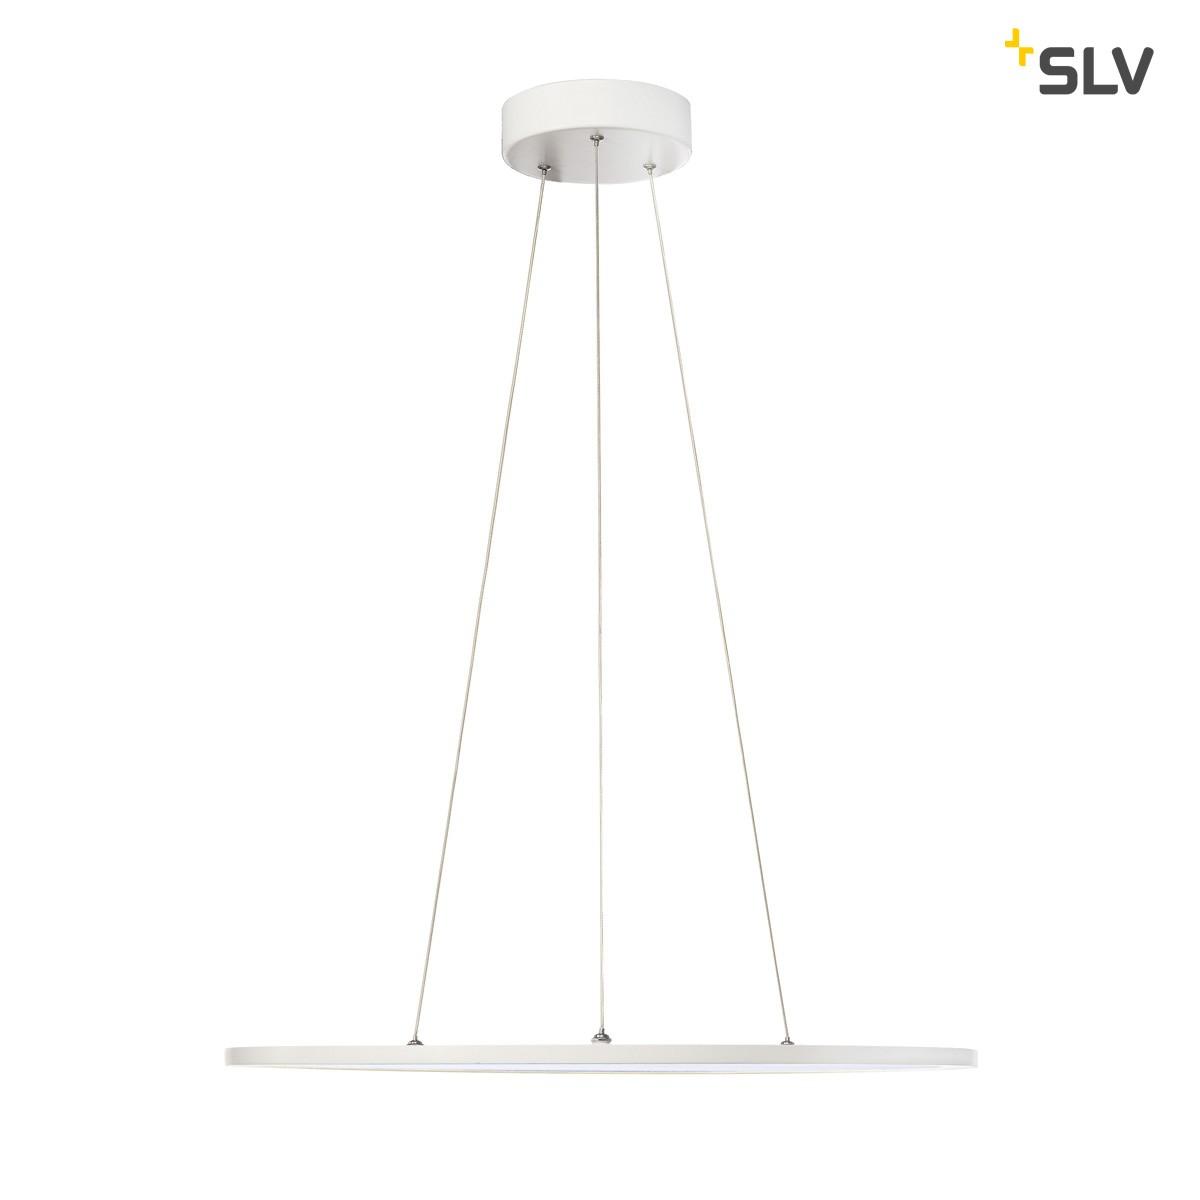 SLV LED Panel Pendelleuchte, 4000°K, weiß